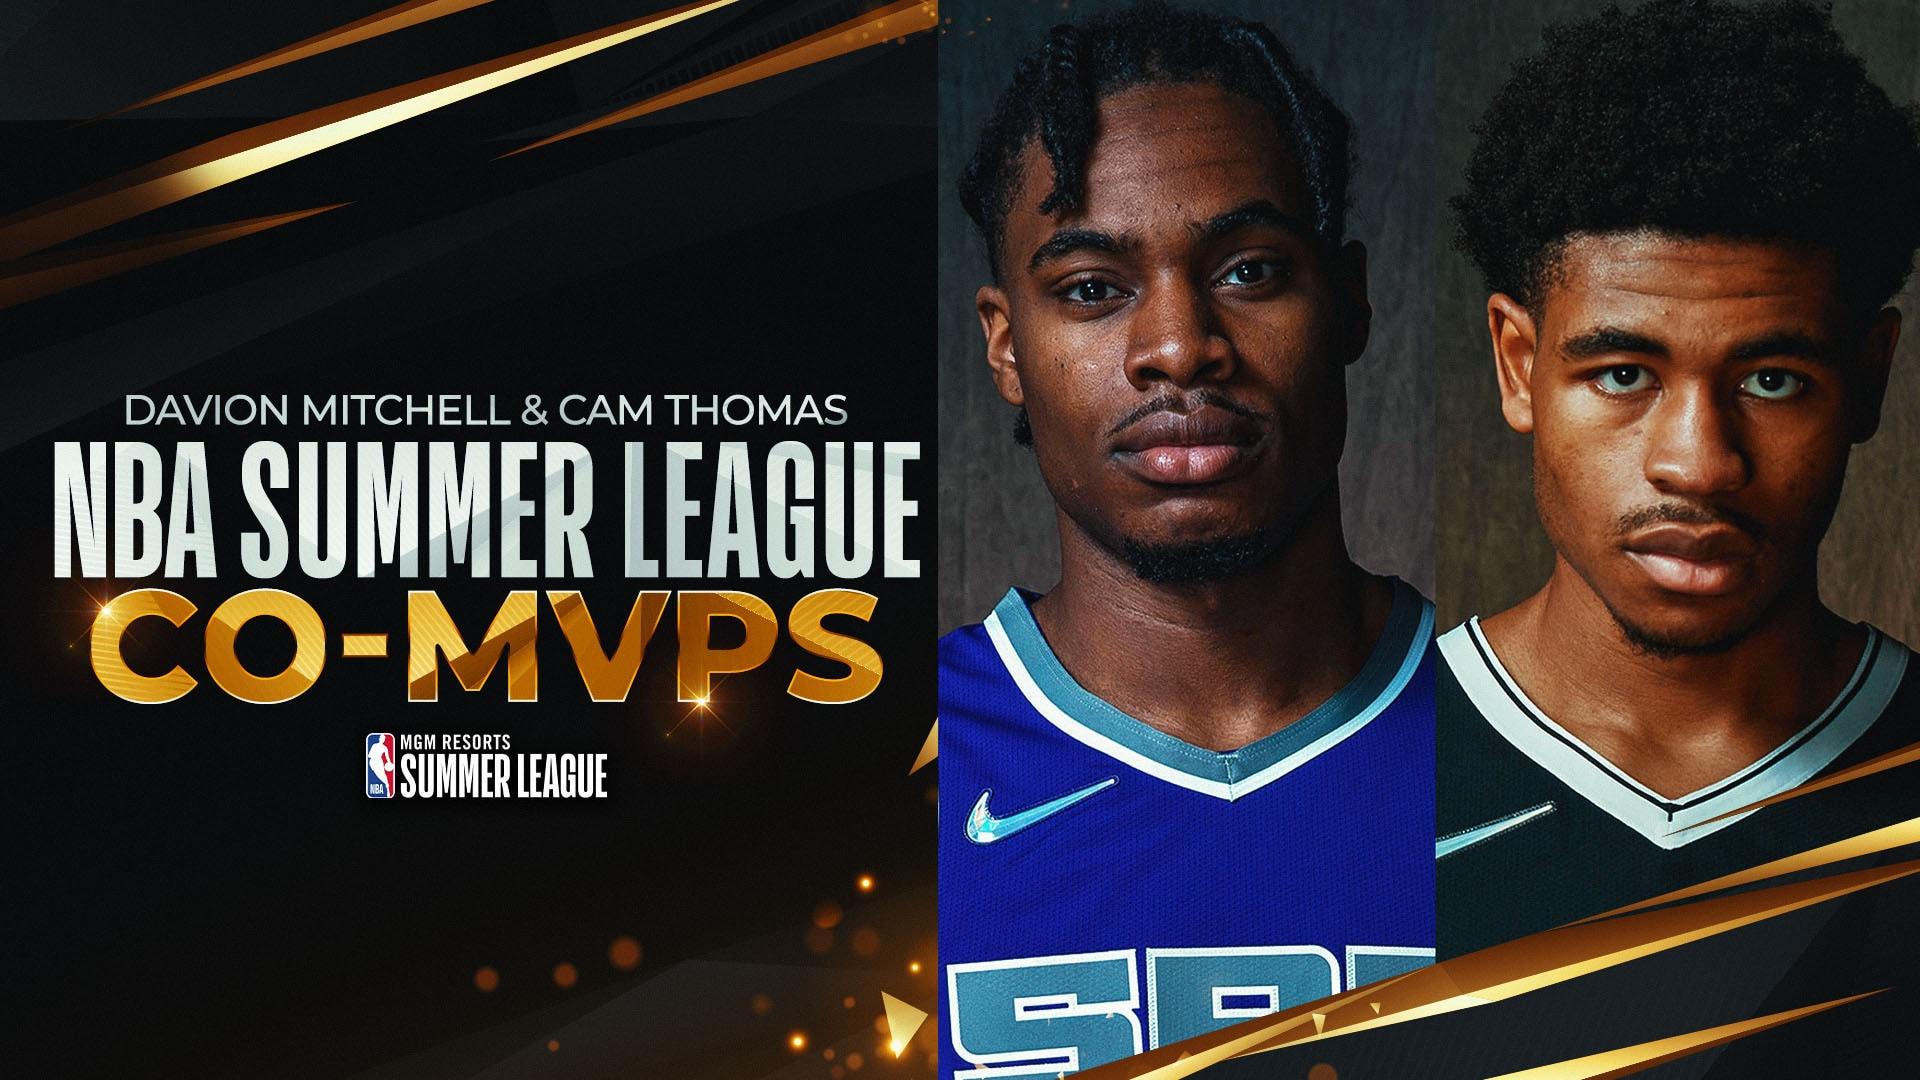 Kings' Davion Mitchell, Nets' Cam Thomas named Summer League co-MVPs